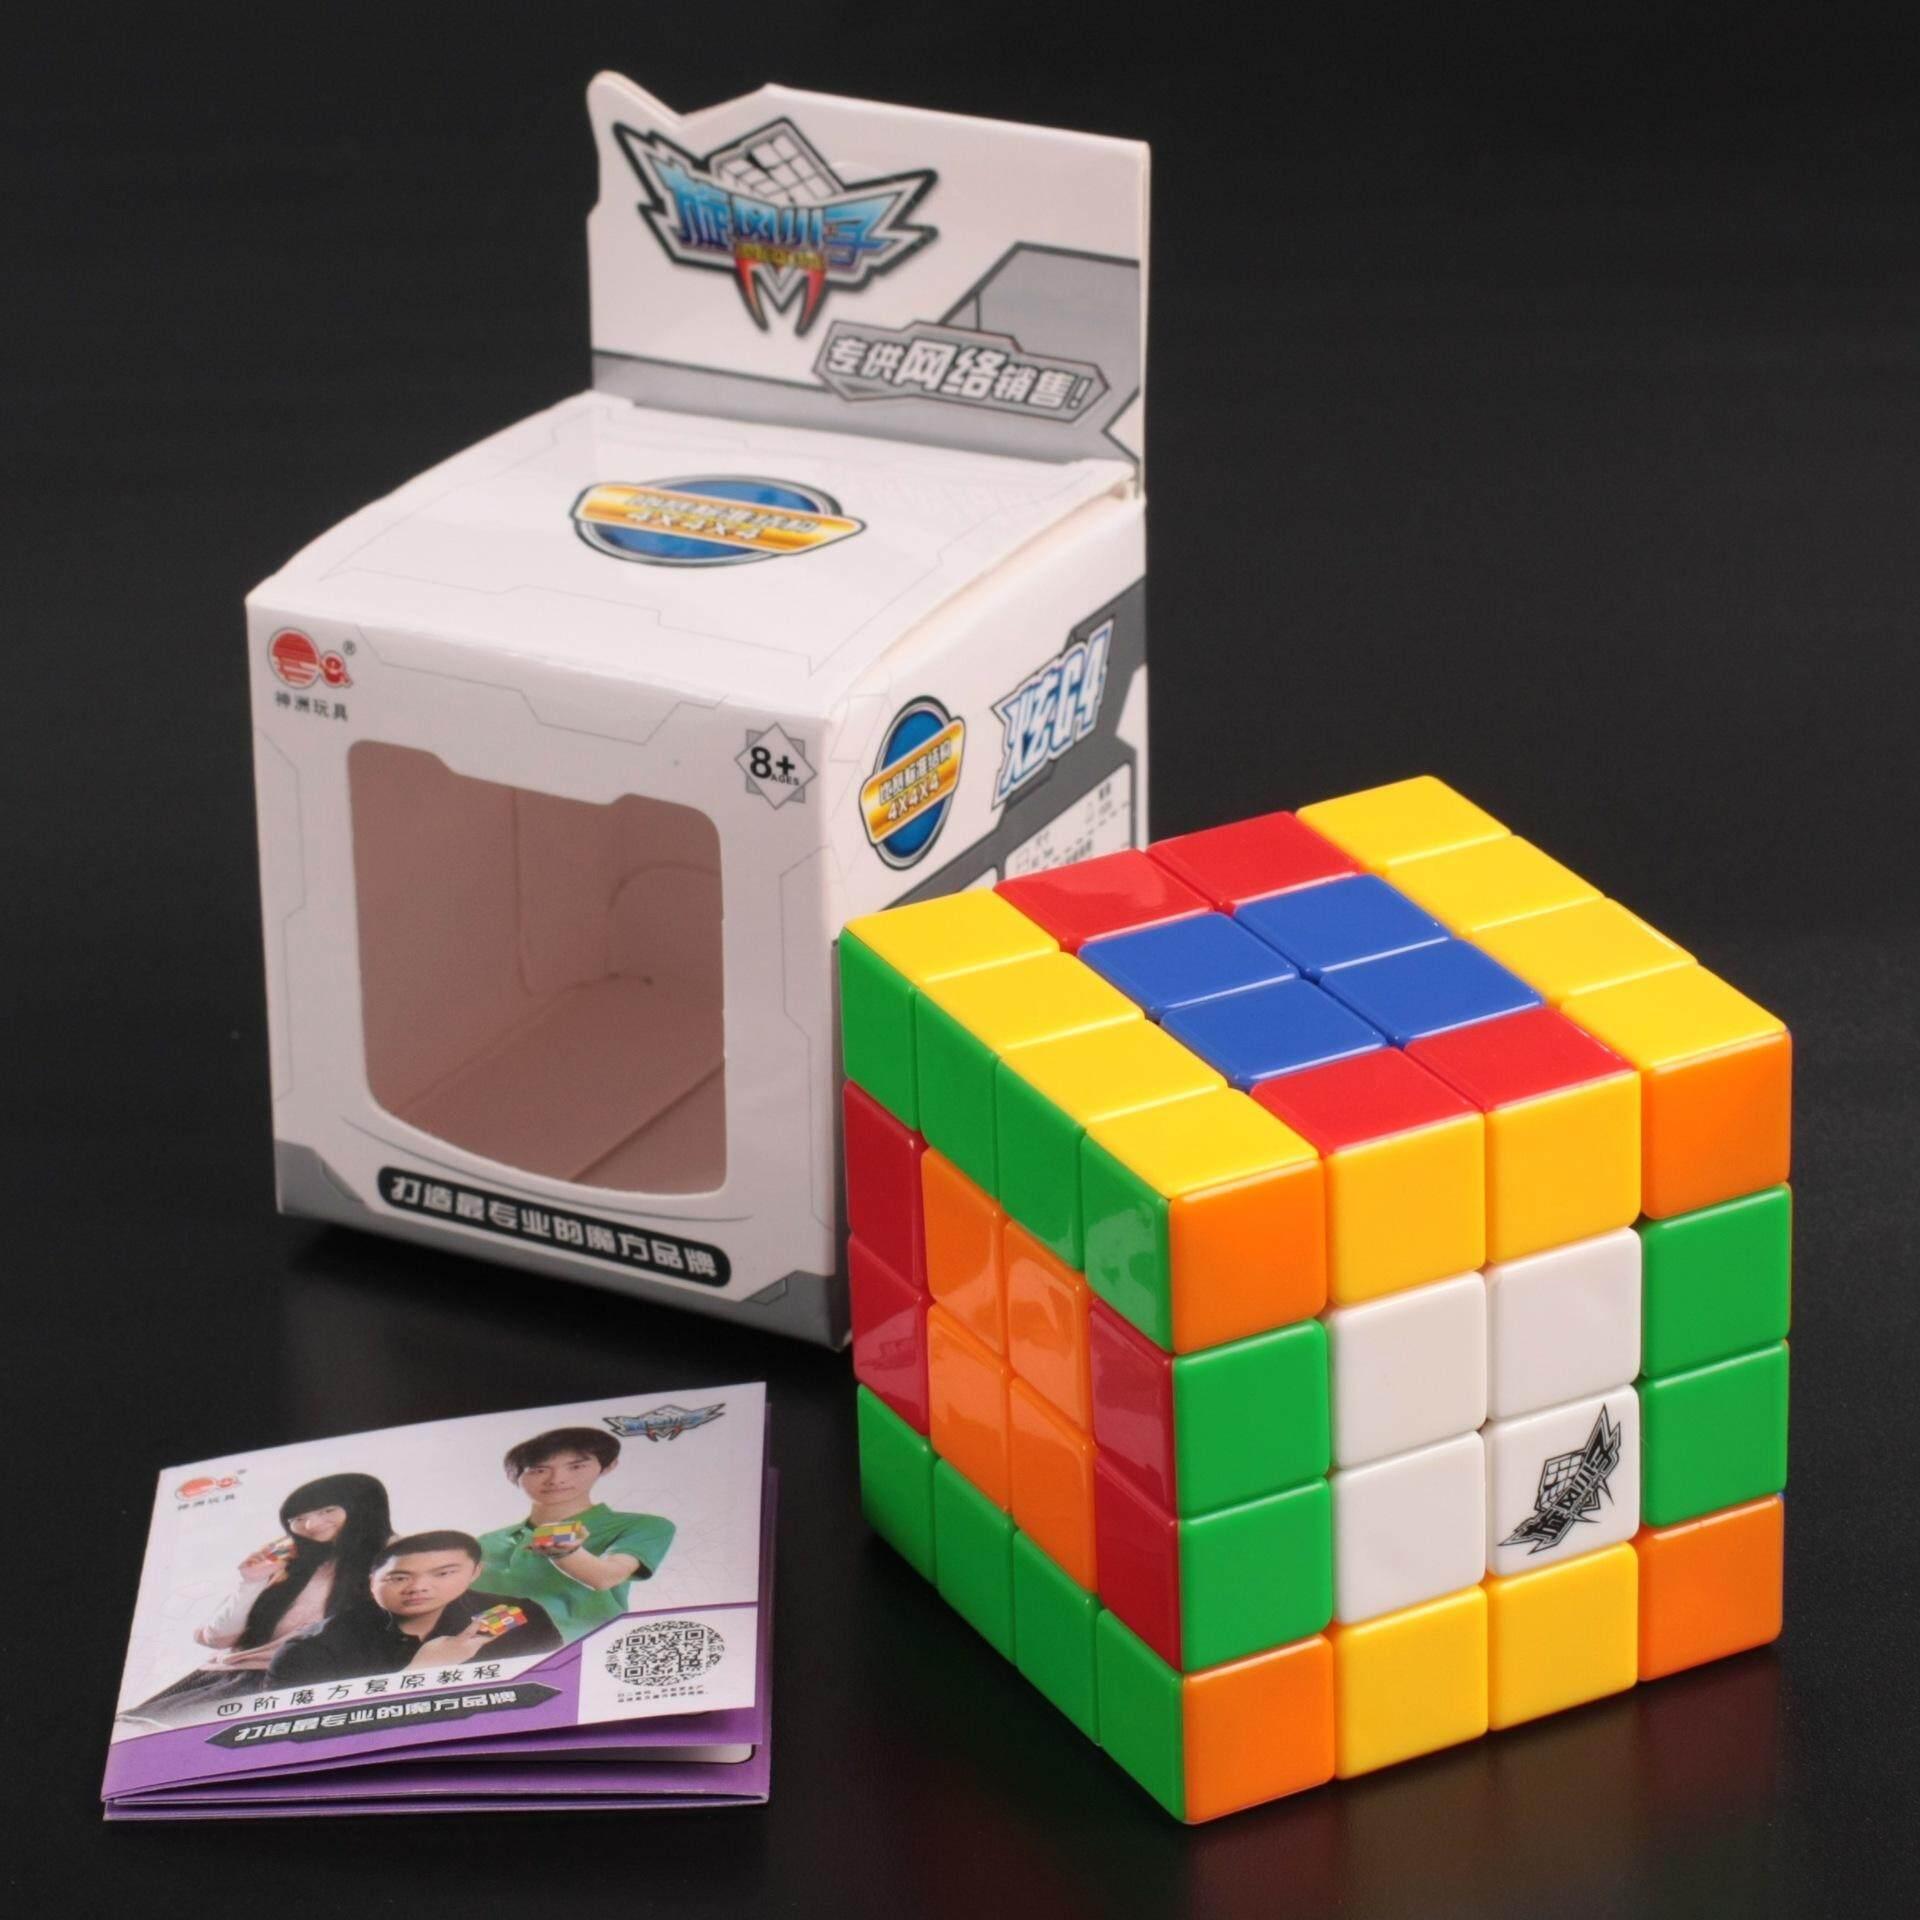 Kelebihan Intelektual Mainan Rubik Gan356s Urutan Ketiga Ic Power S2mu005x Samsung J7 Prime Kd 002501 Cyclone Boys Produk Asli Warna Solid Profesional